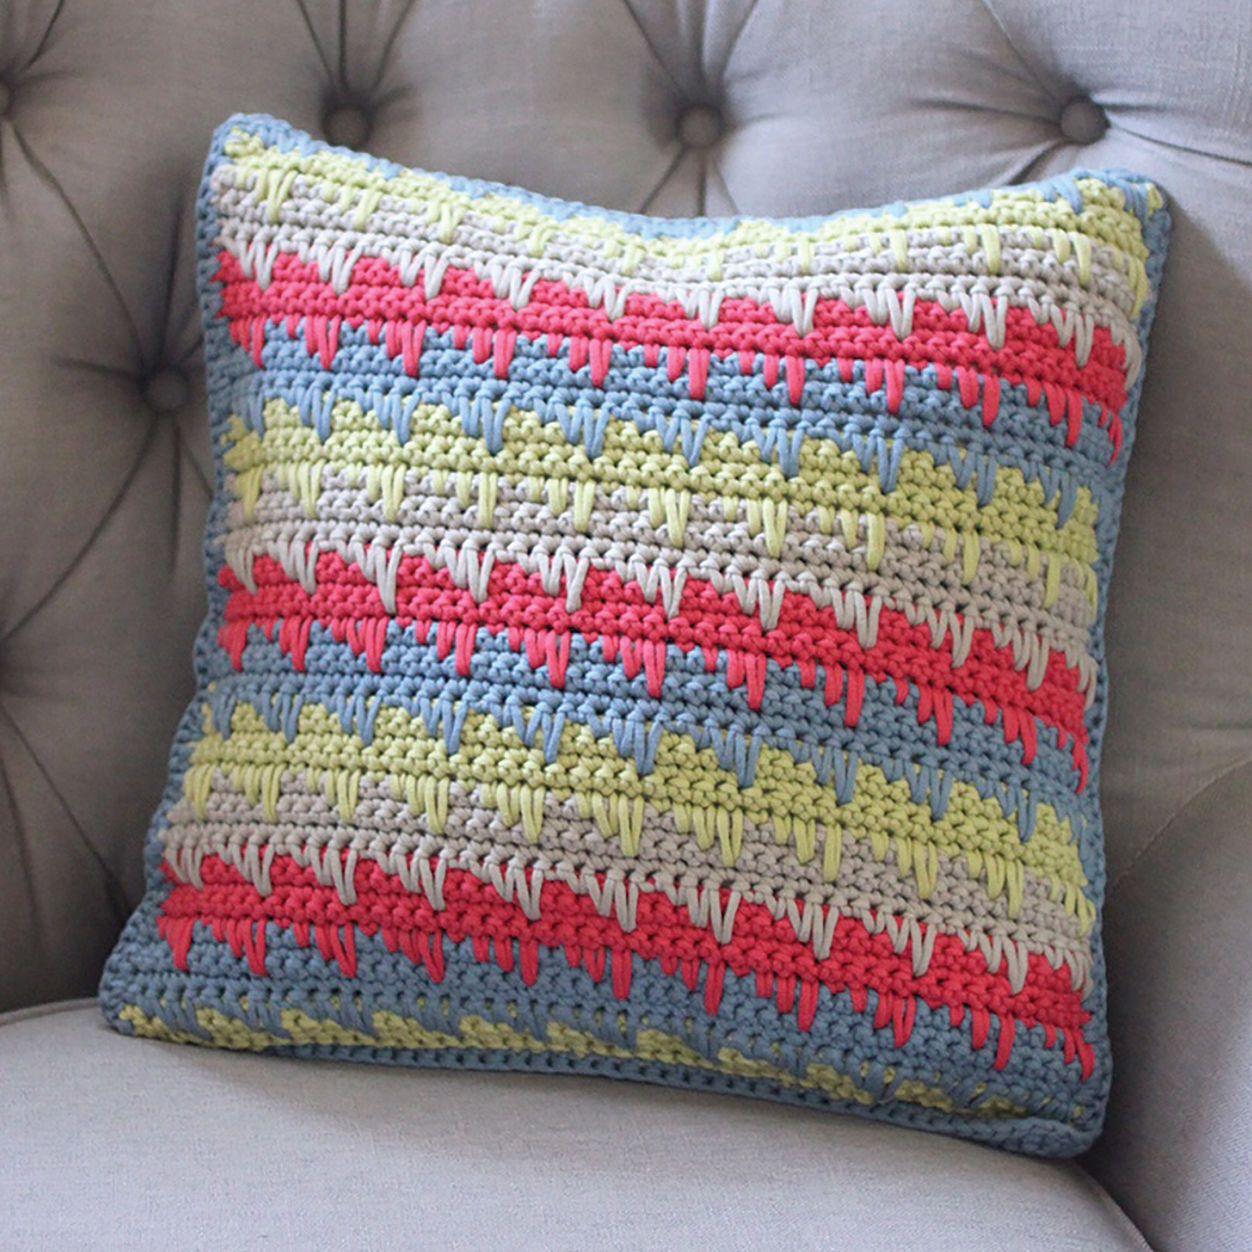 Bernat Reversible Spike Stitch Pillow Cover | Crochet Ideas to make ...